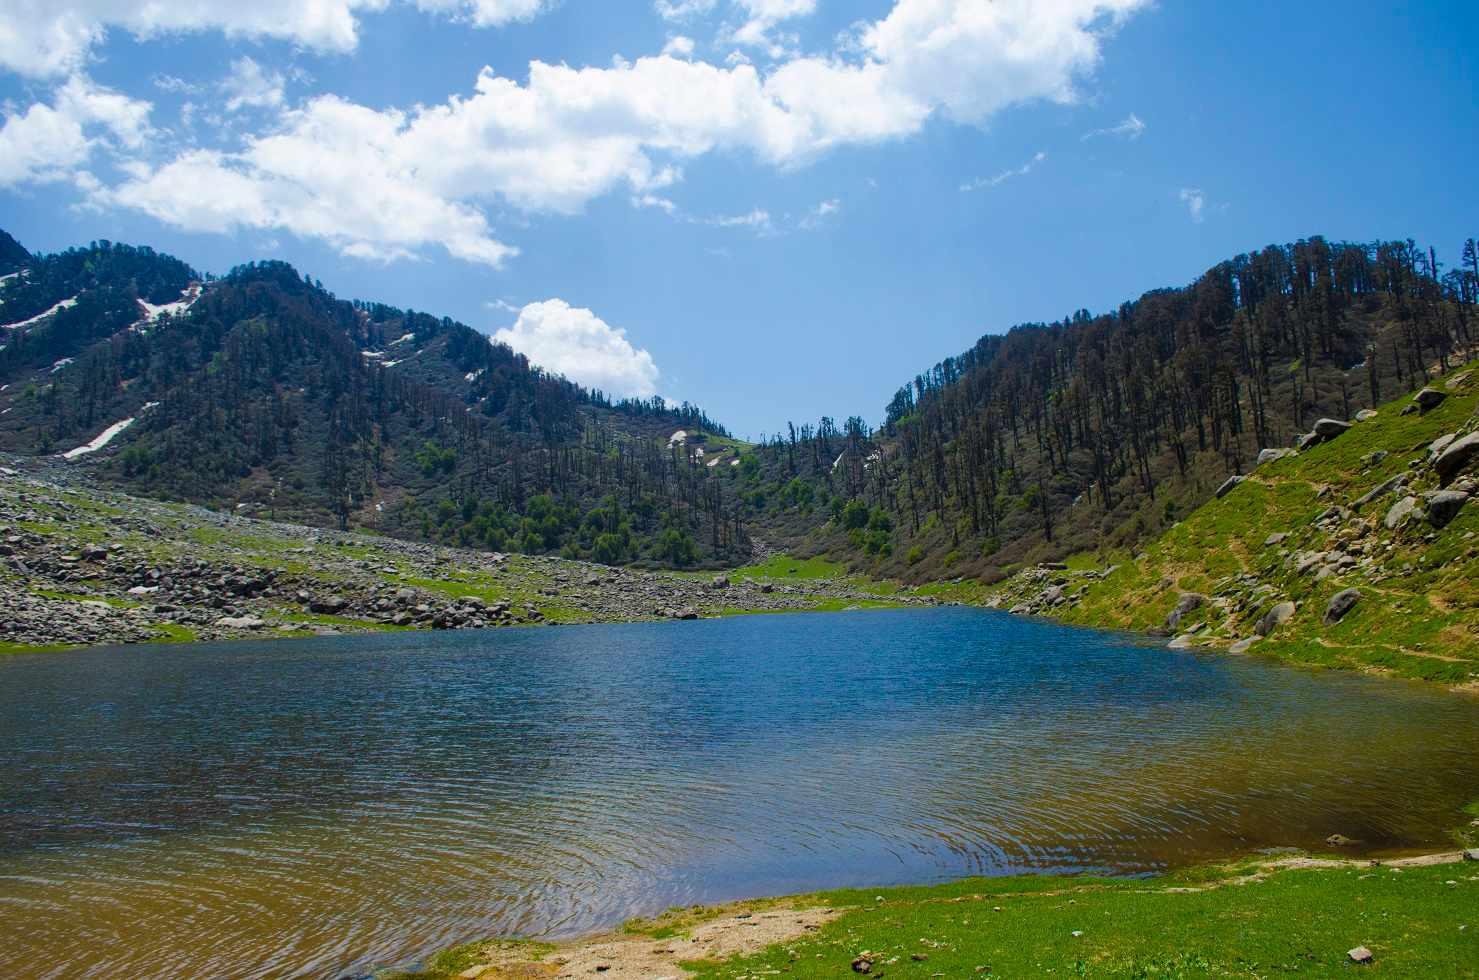 Kareri Lake Trek - An Unexplored Beauty